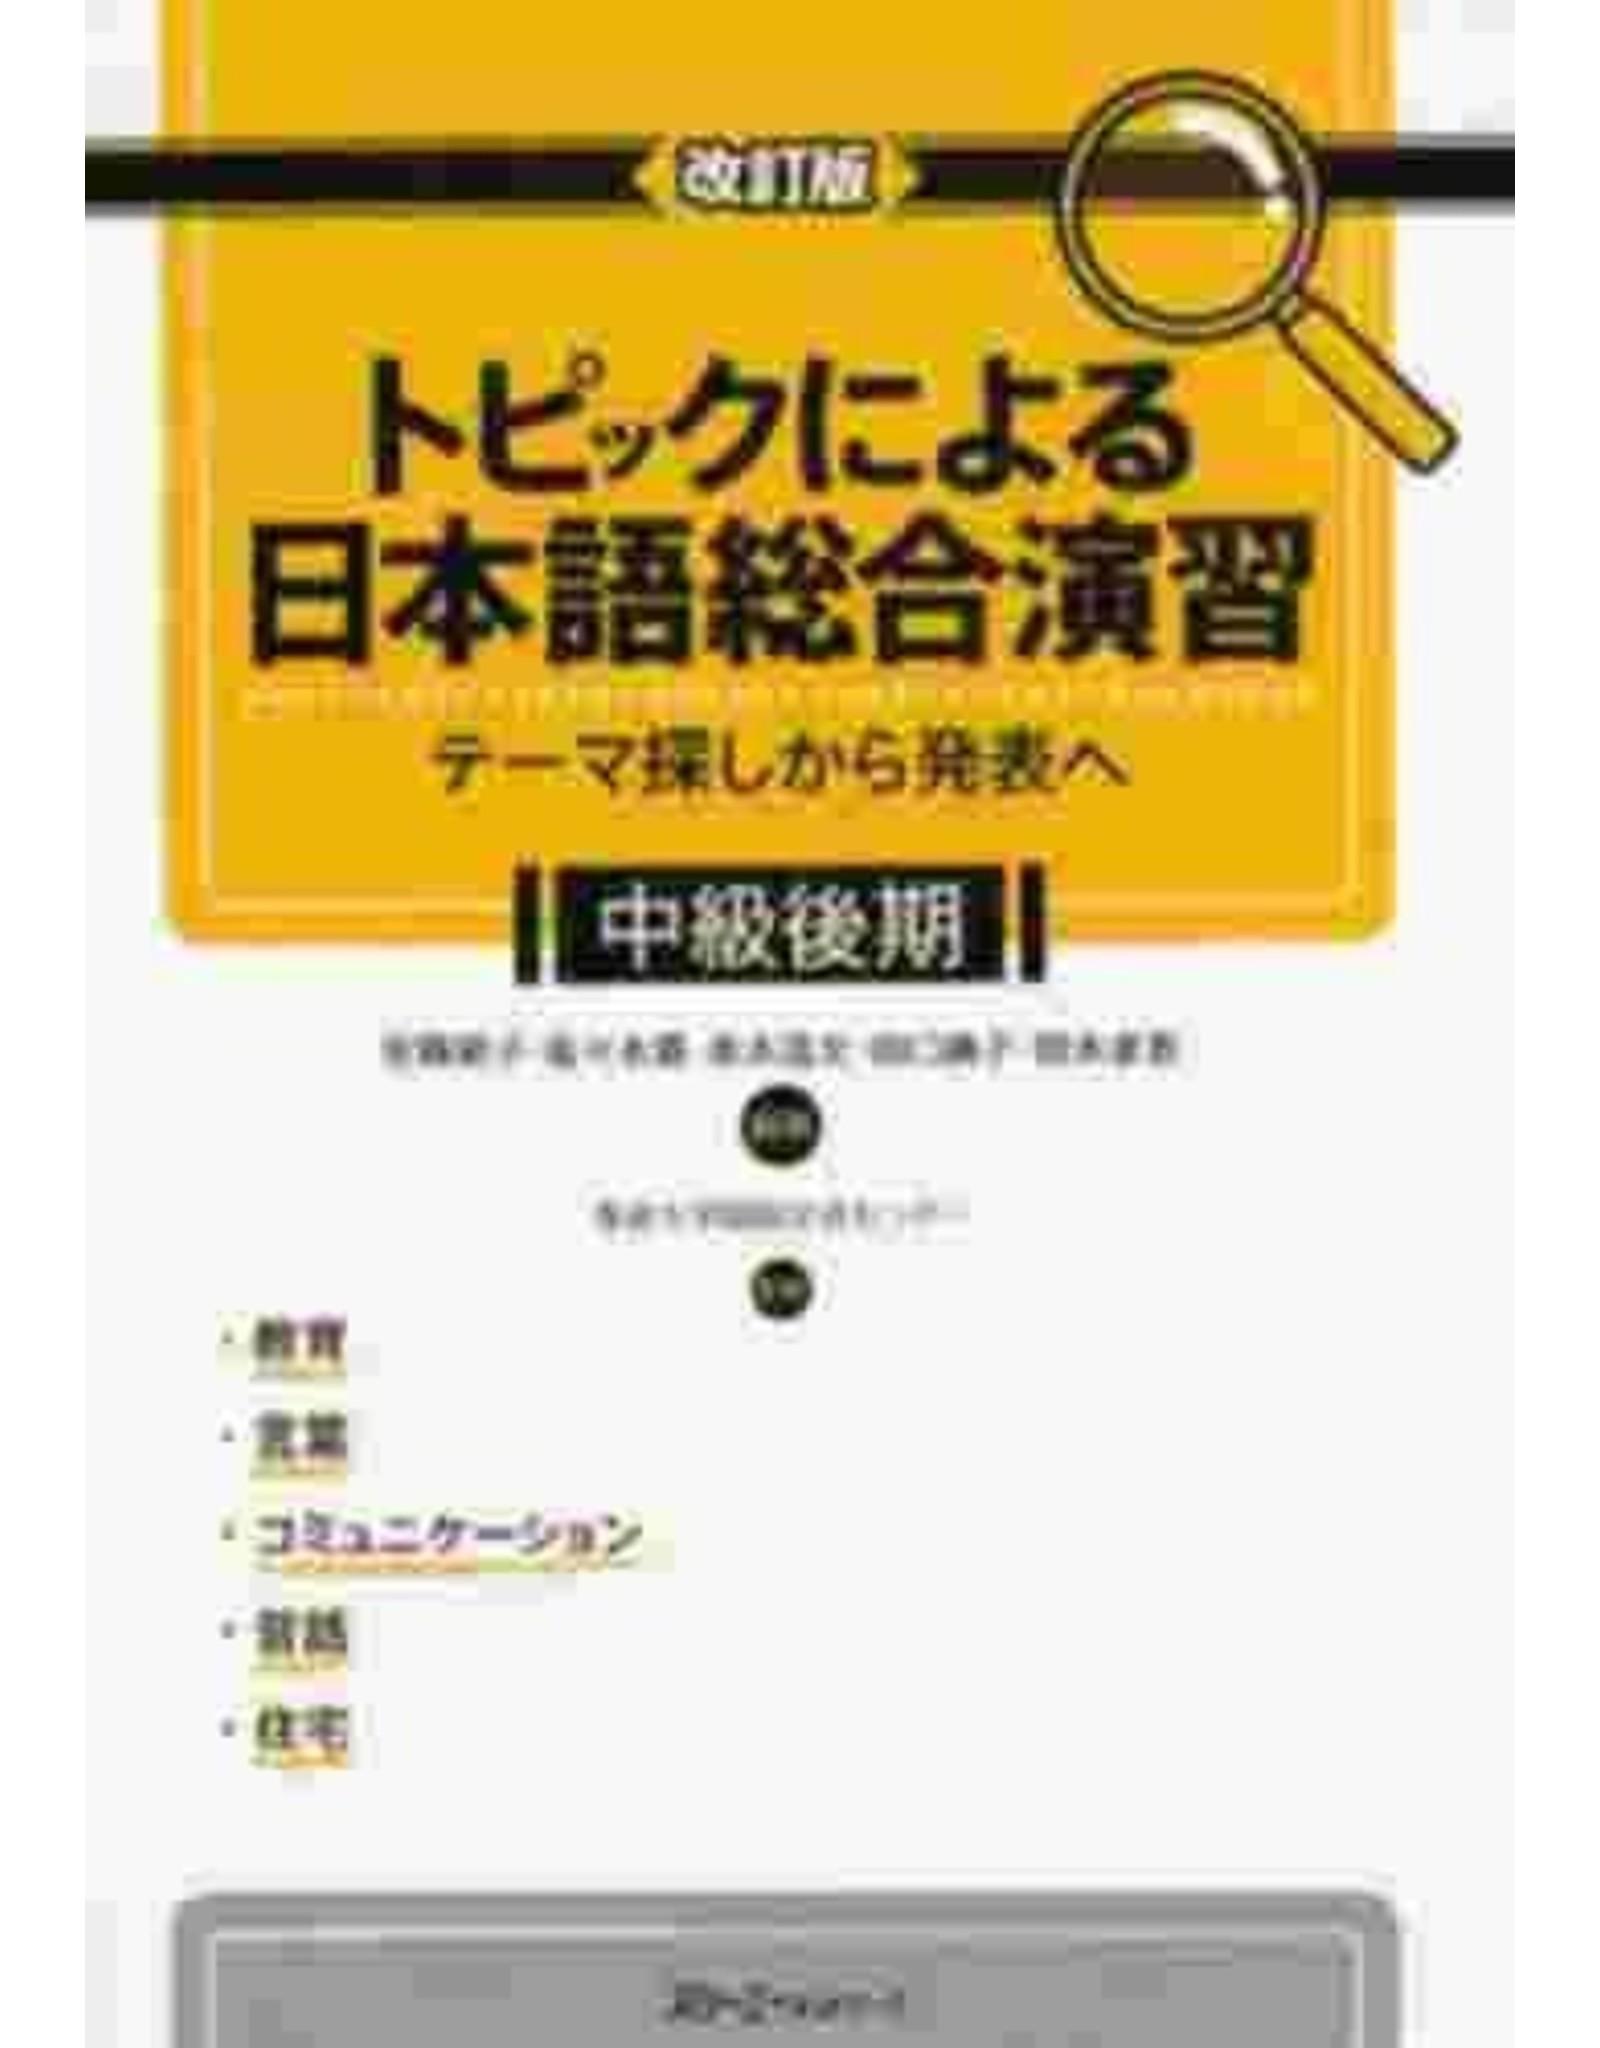 3A Corporation TOPIC NI YORU ENSHU-CHUKYU KOUKI (REV) - CONPREHENSIVE JAPANESE PRACTICE/ SPECIFIC TOPICS-UPPER INTER(REV)